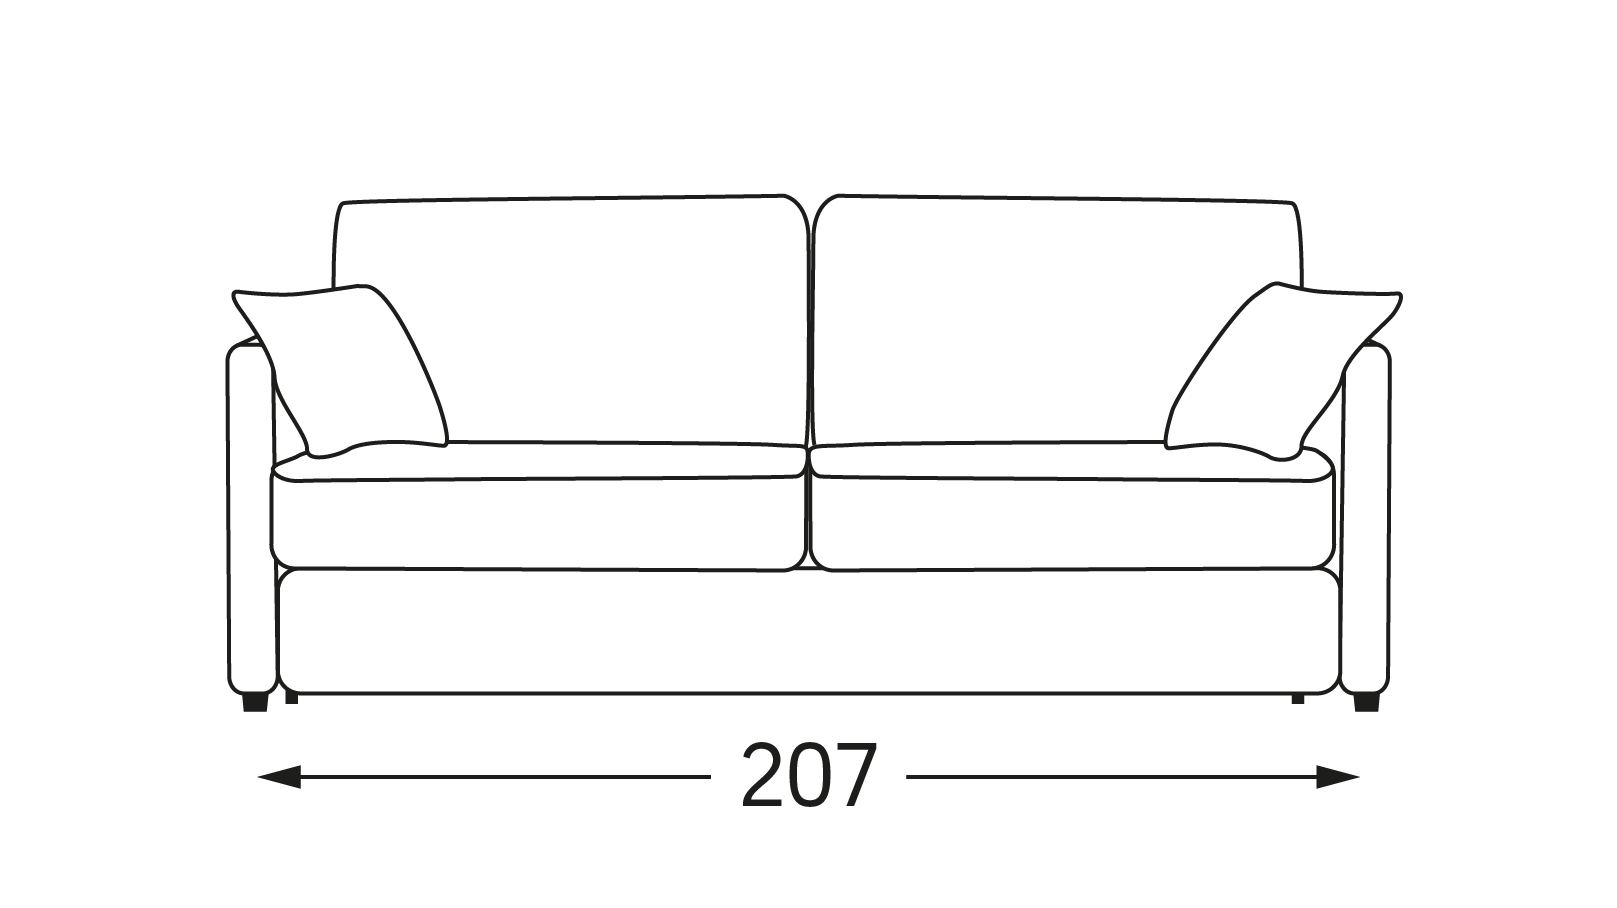 canape convertible montana 207 moulins